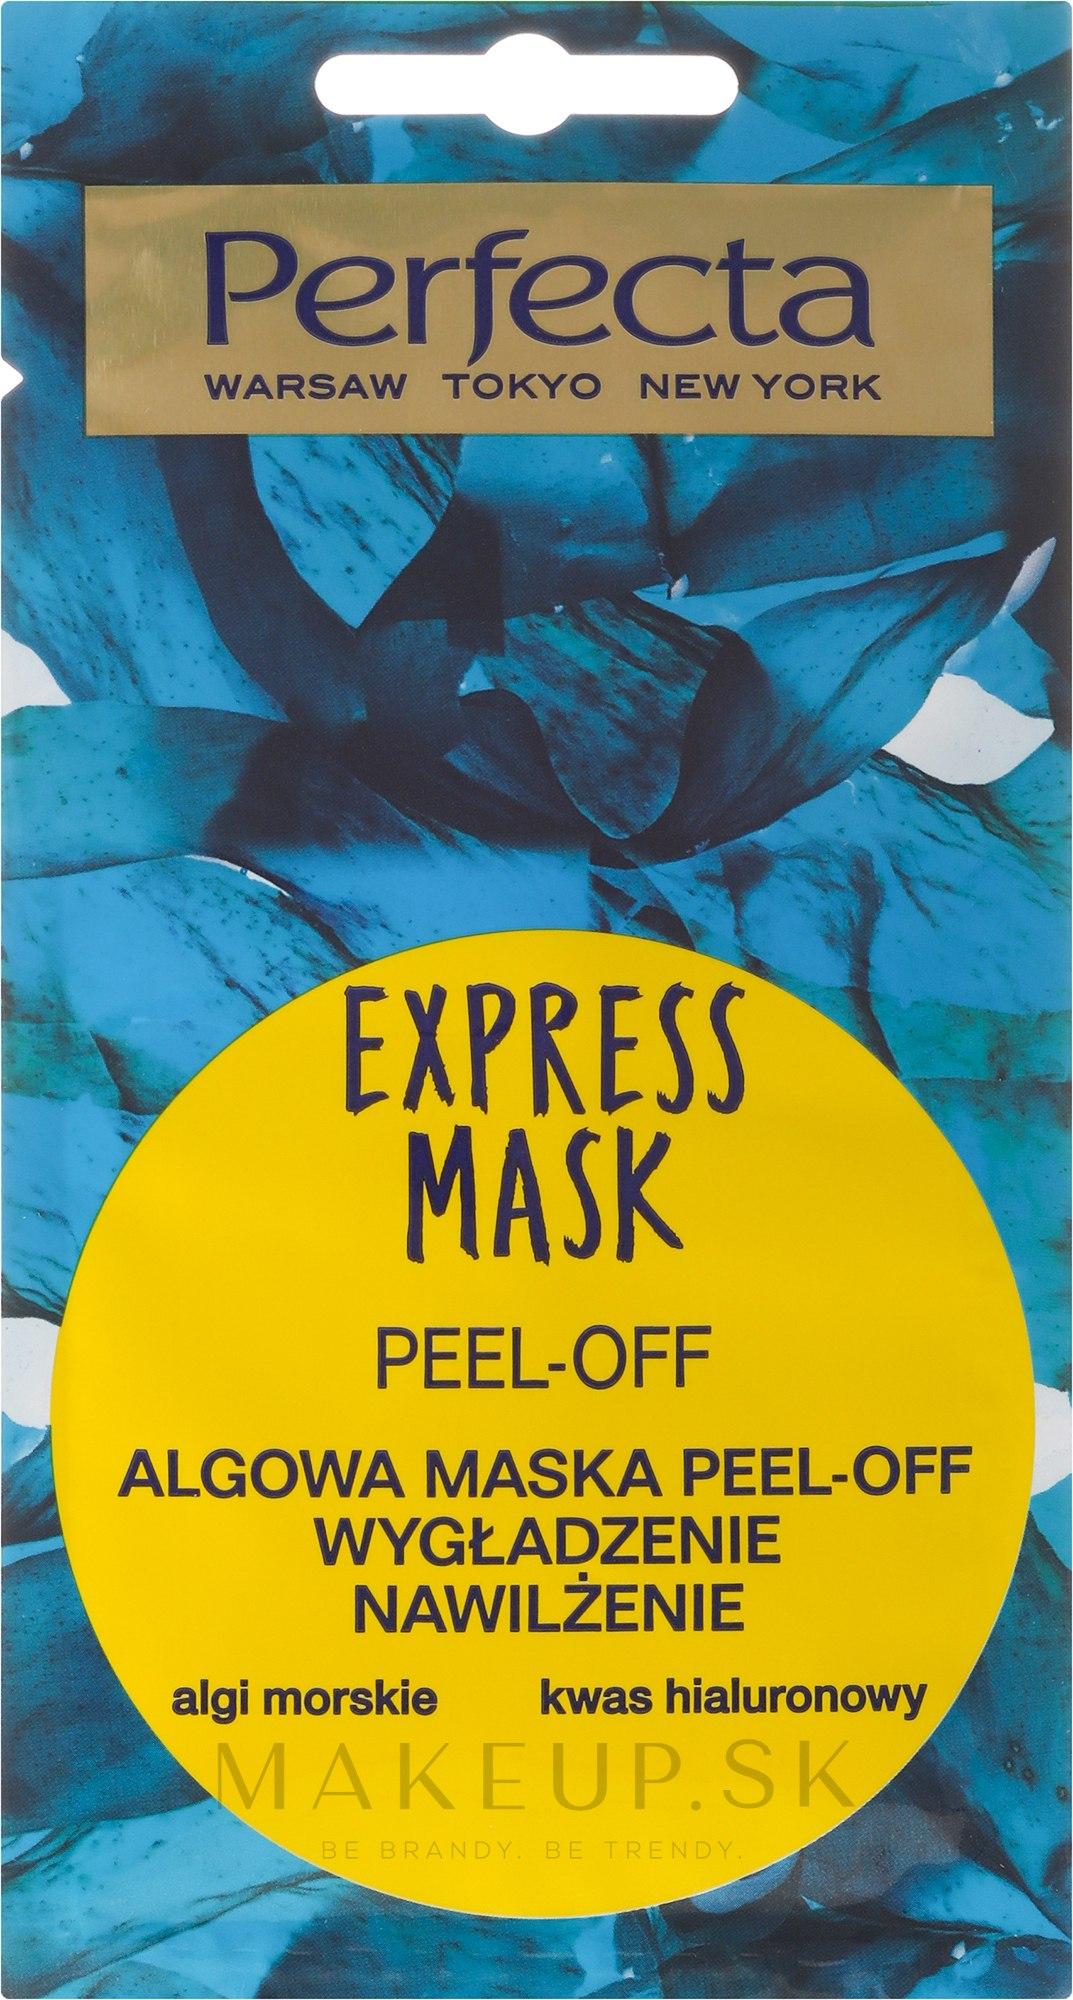 Maska zlupovacia na tvár s riasami - Perfecta Express Mask — Obrázky 8 ml